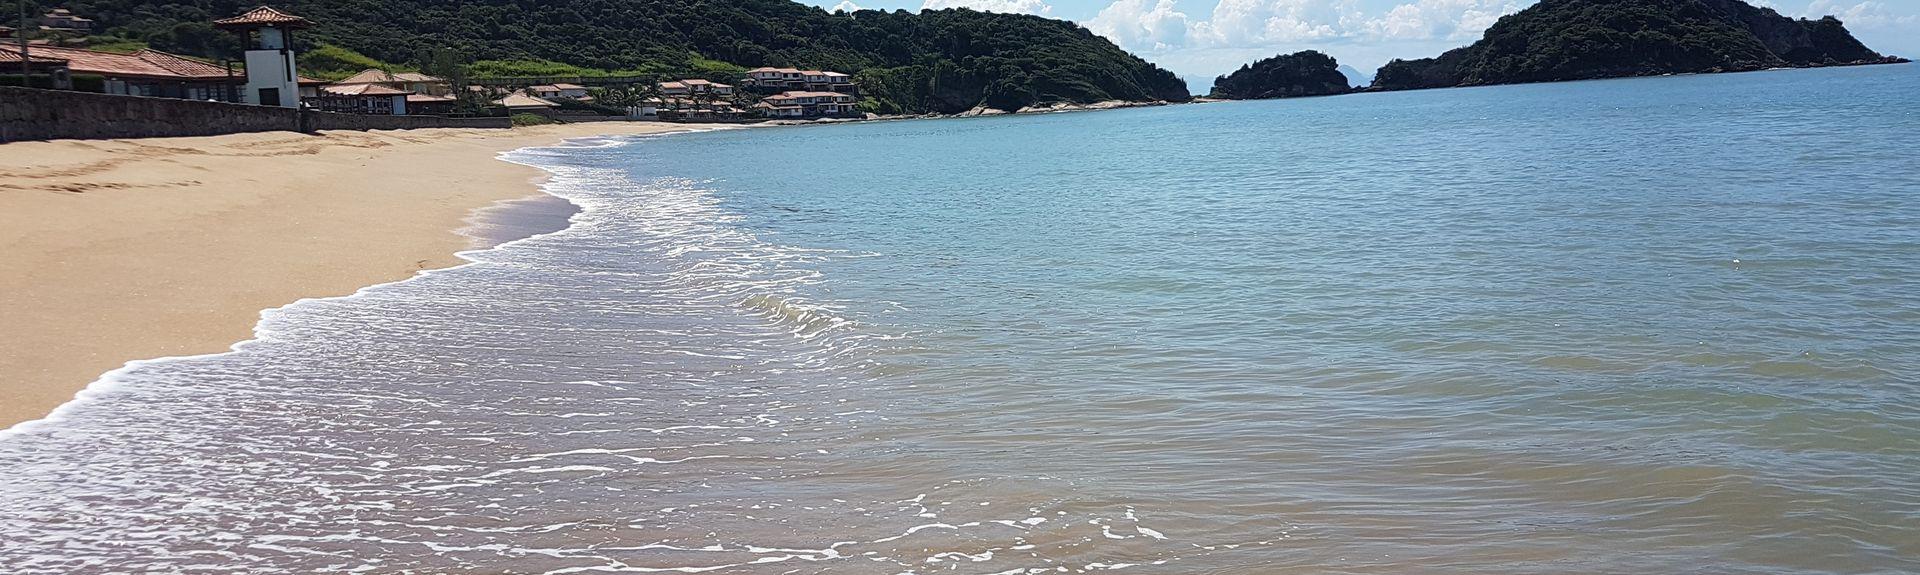 Marina, Búzios - RJ, Brazil